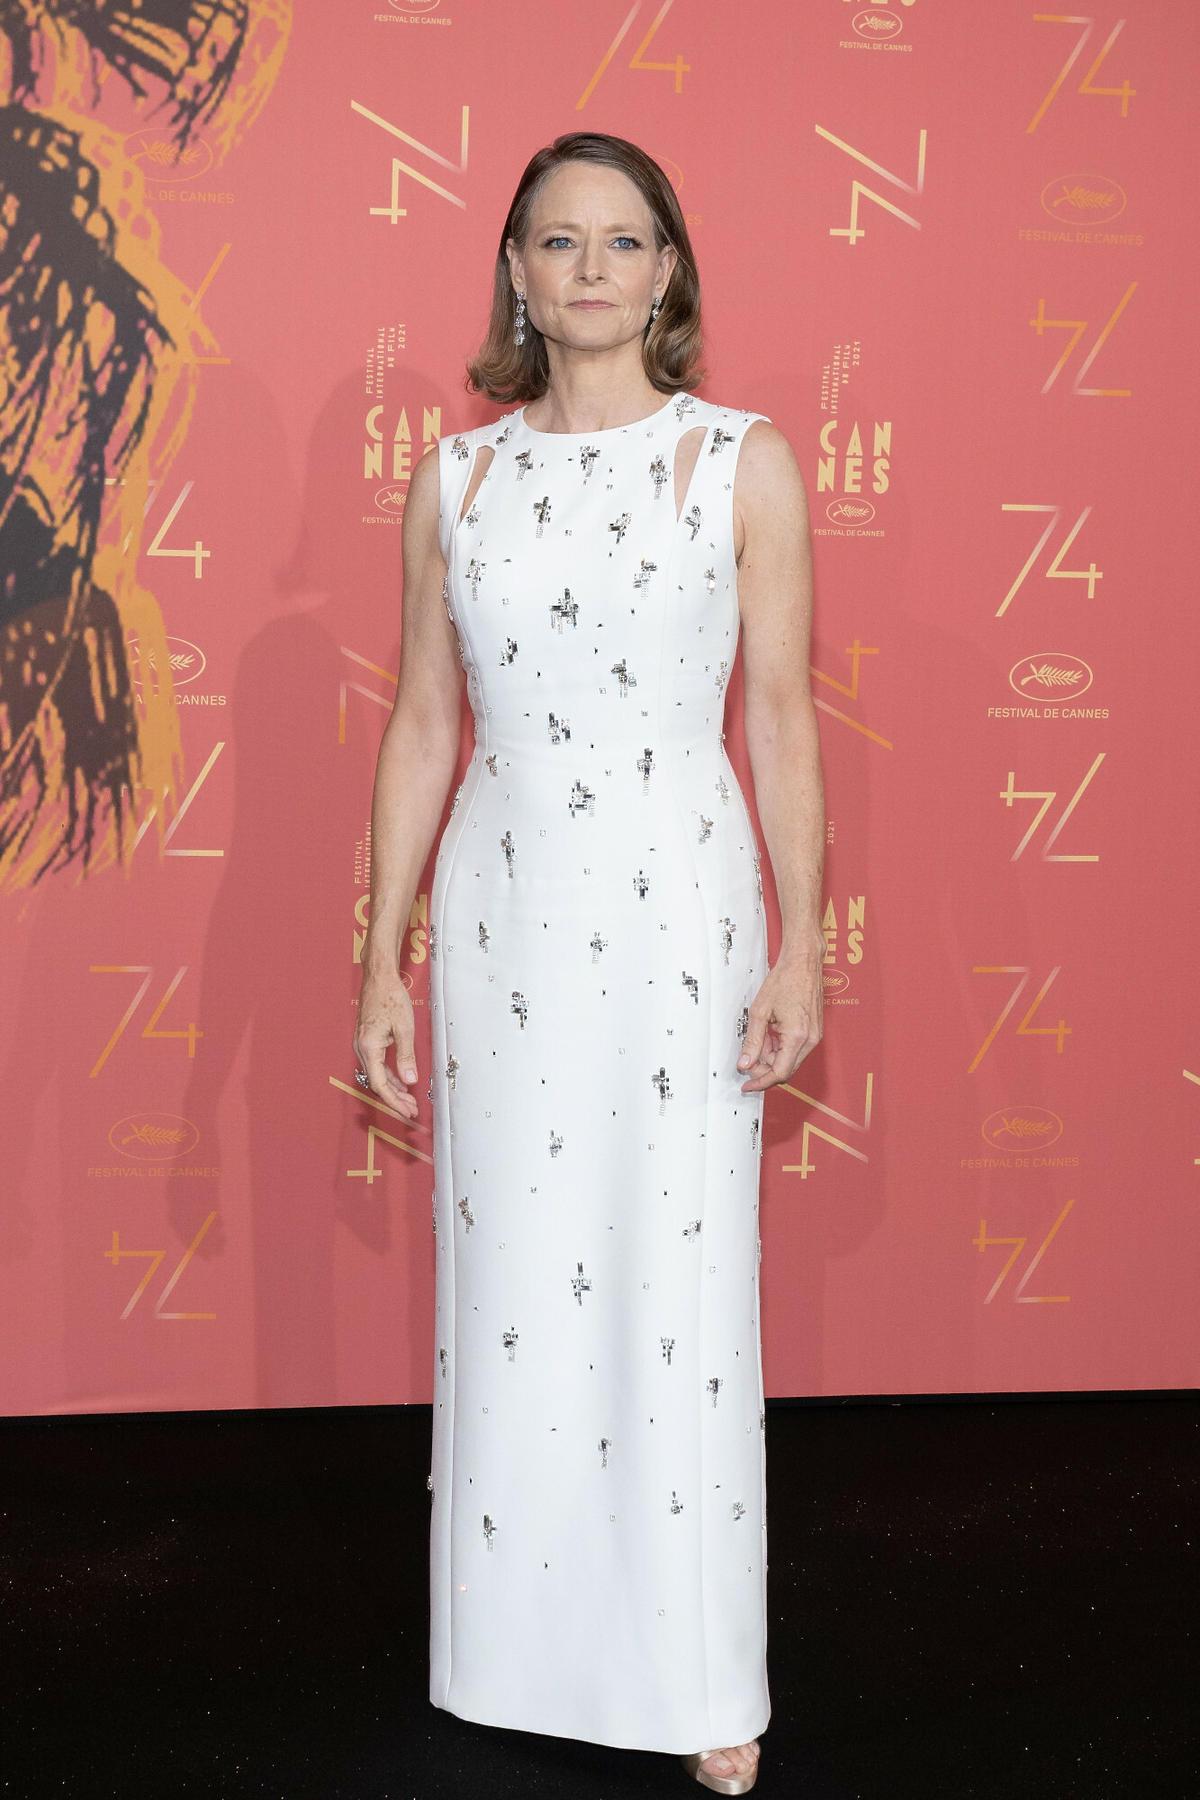 Cannes 2021: Jodie Foster